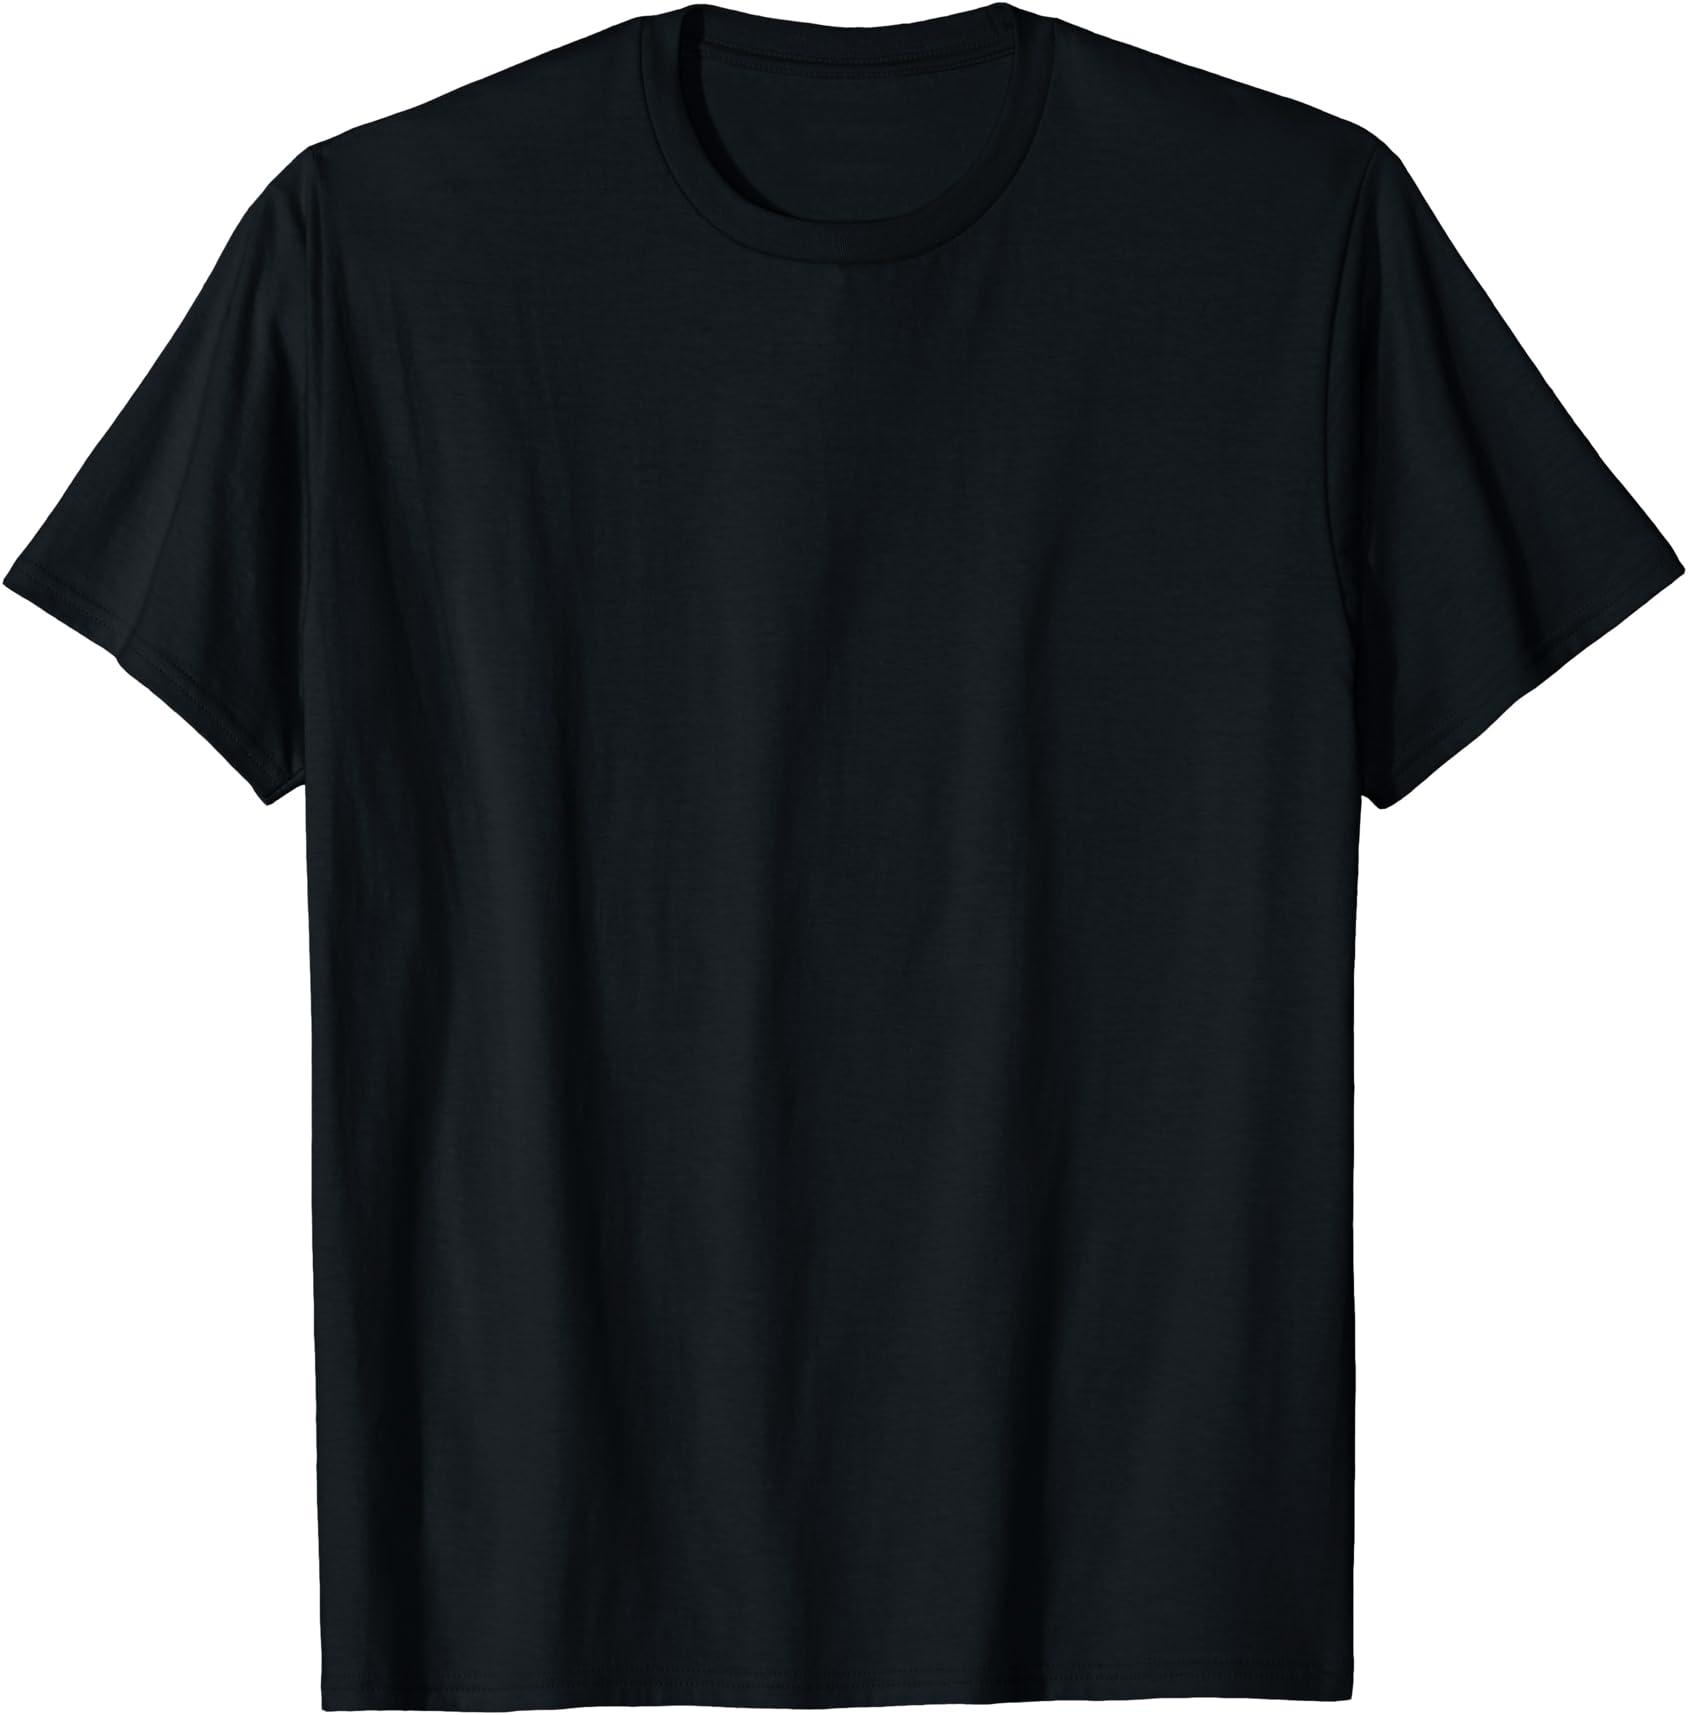 Im Here For Savasana Yoga Cute Top Funny Workout Black Basic Men/'s T-Shirt